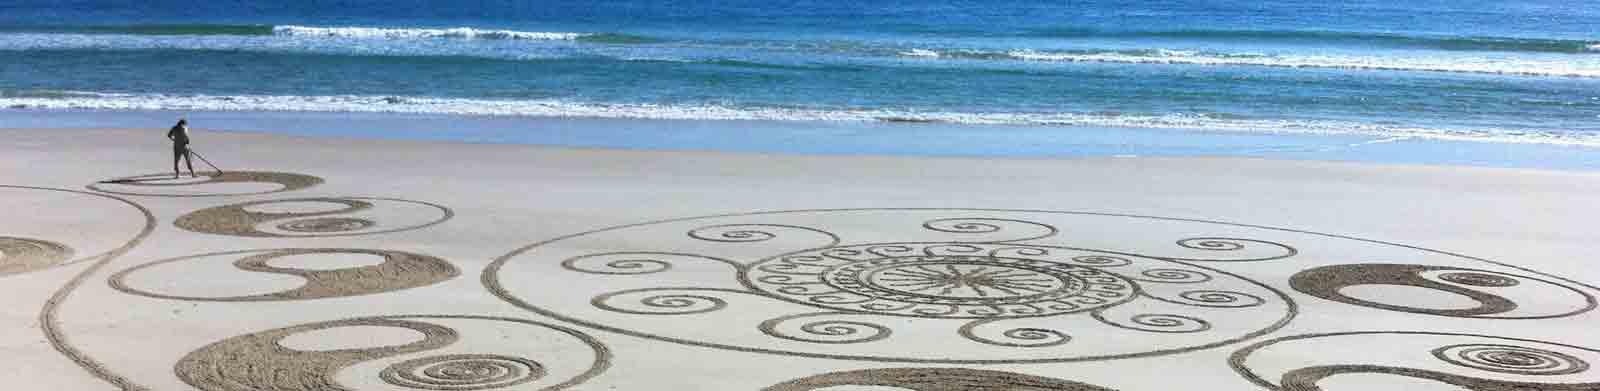 byron-coaching-sand-mural